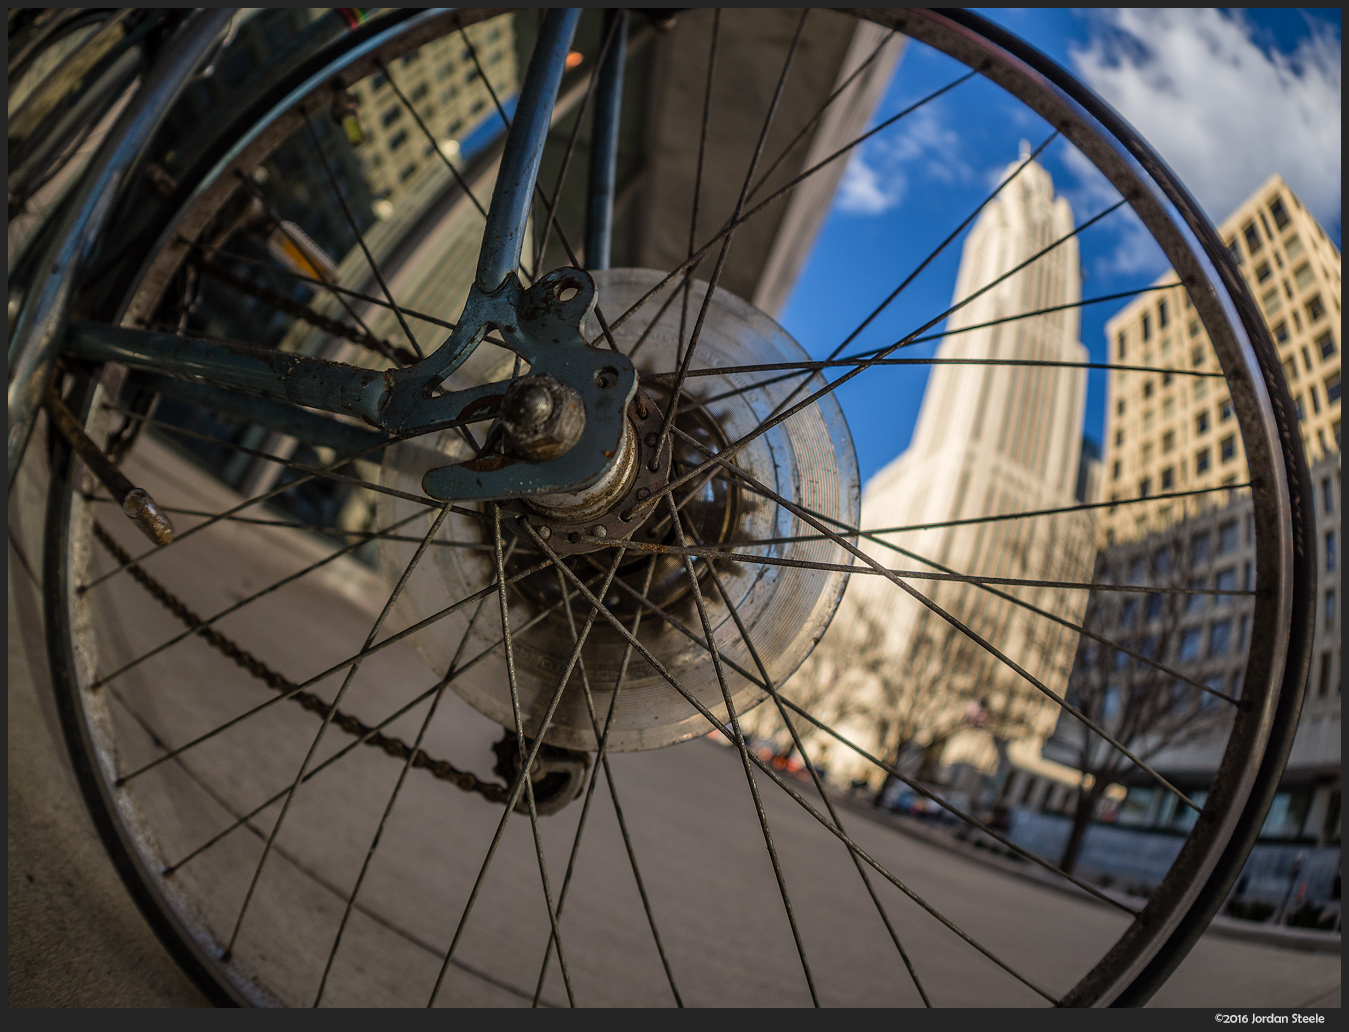 View from a Bike Wheel - Olympus OM-D E-M10 Mark II with Olympus 8mm f/1.8 Fisheye PRO @ f/4